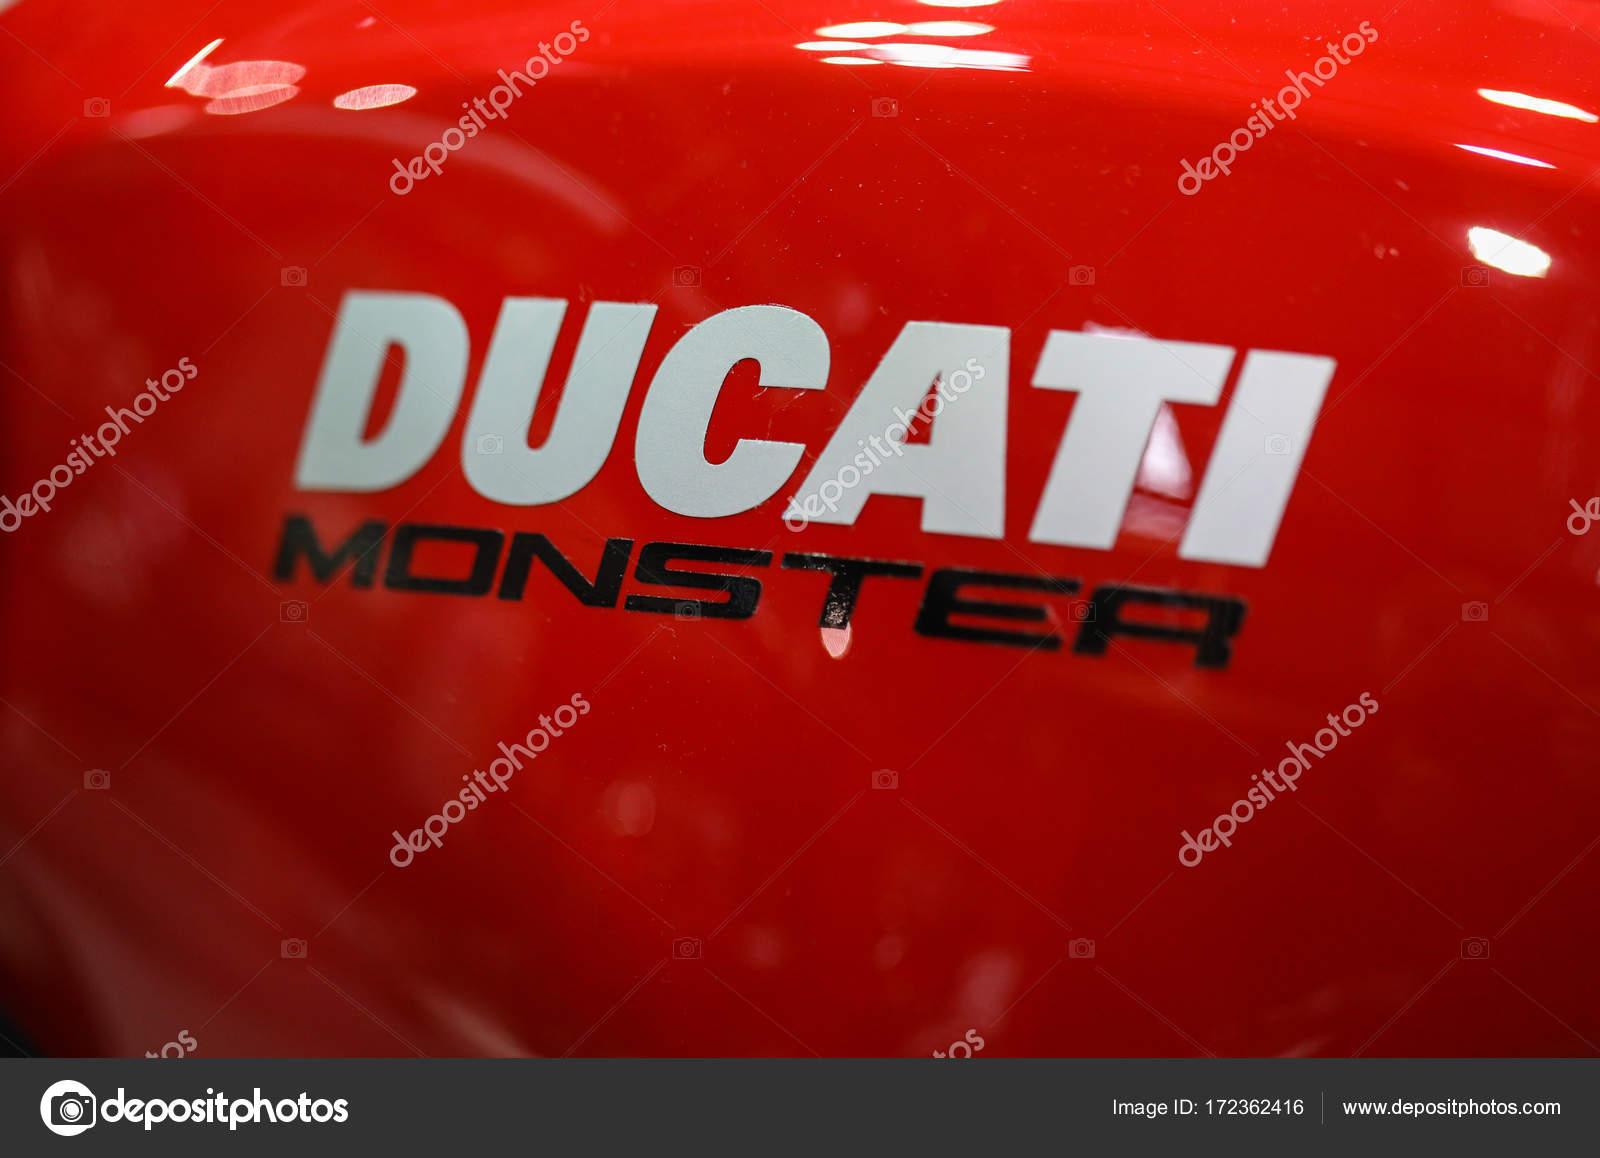 Ducati Logo Closeup On Ducati Motorcycle Displayed At Moto Show In